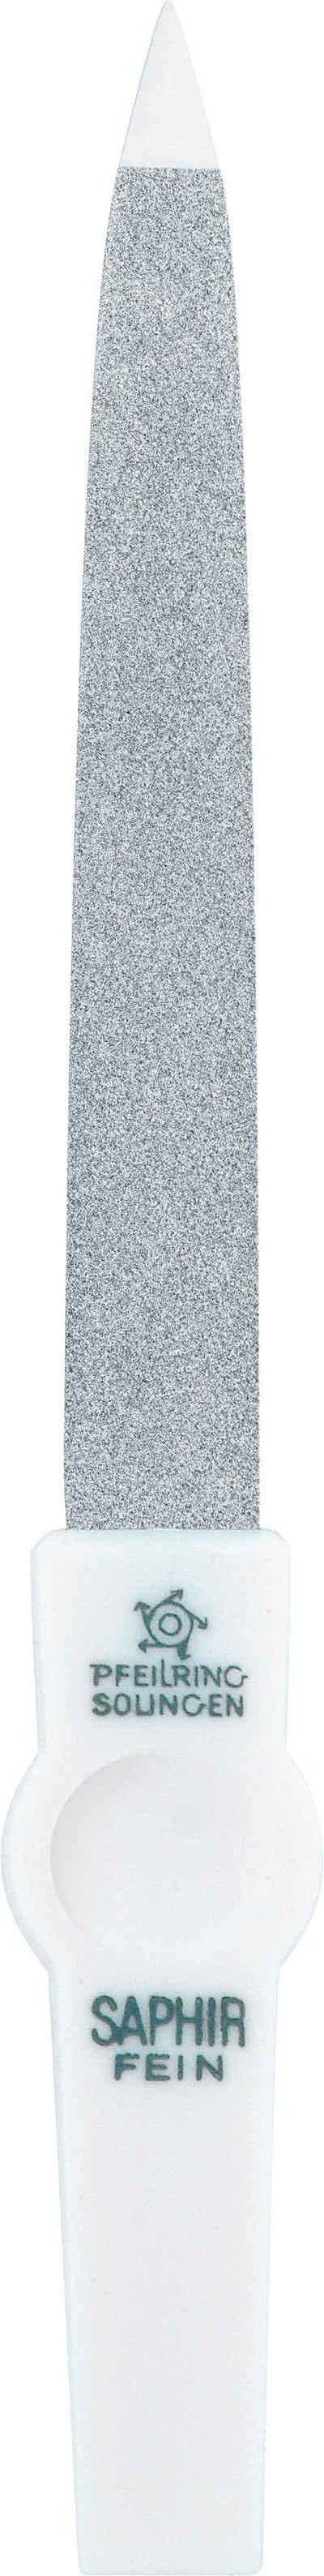 PFEILRING Saphir-Nagelfeile, 13 cm